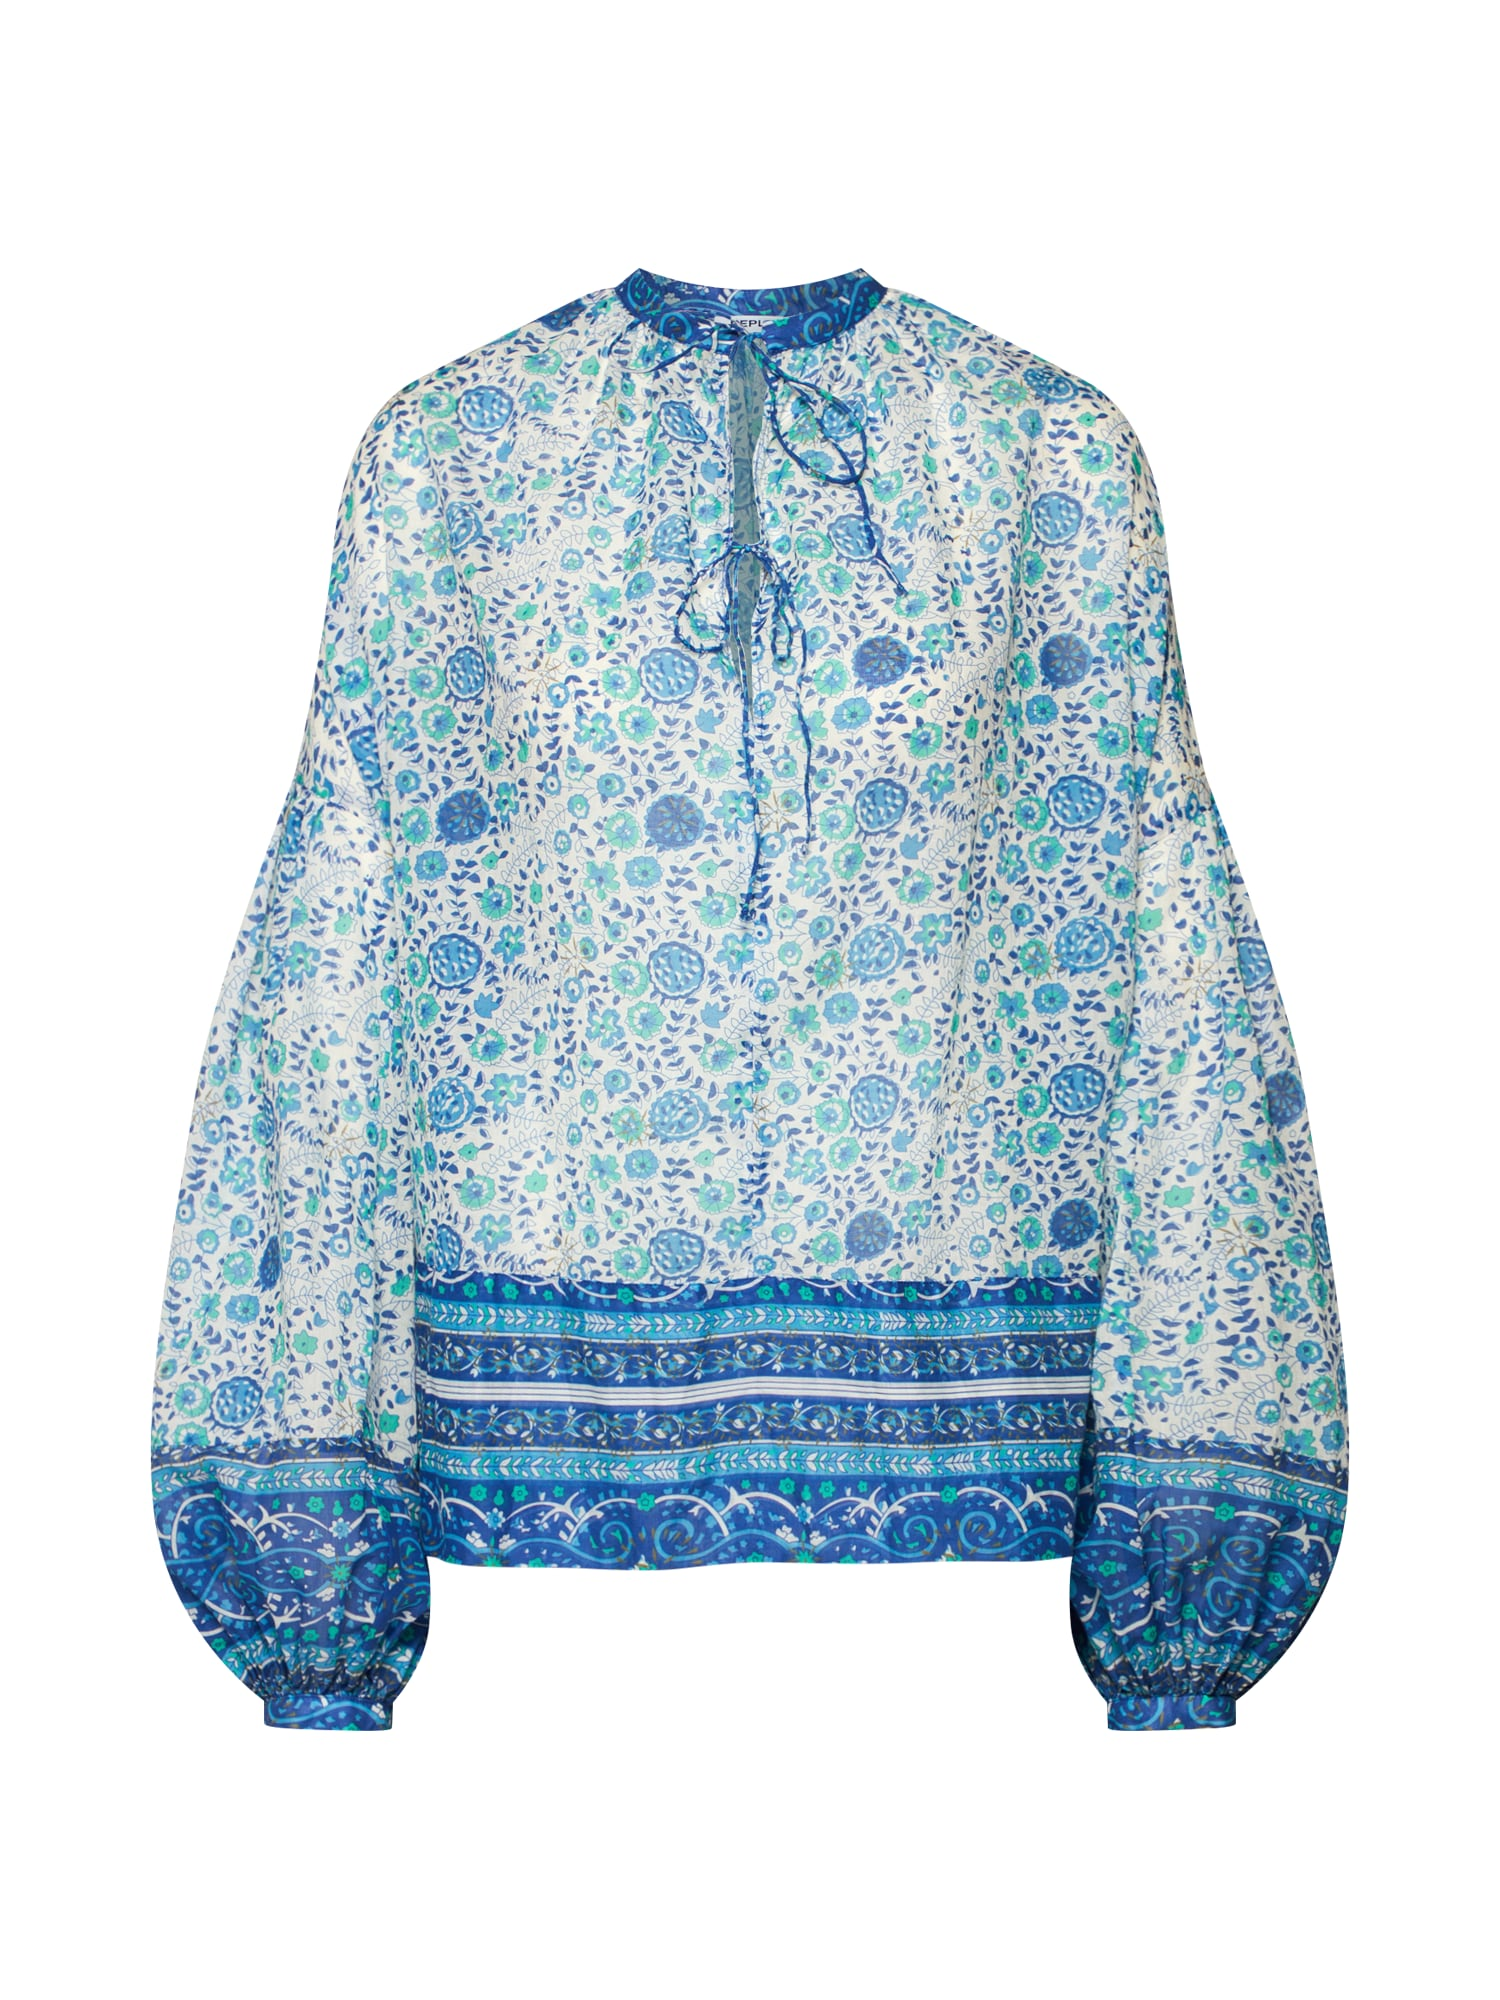 REPLAY Tunika mėlyna / nefrito spalva / balta